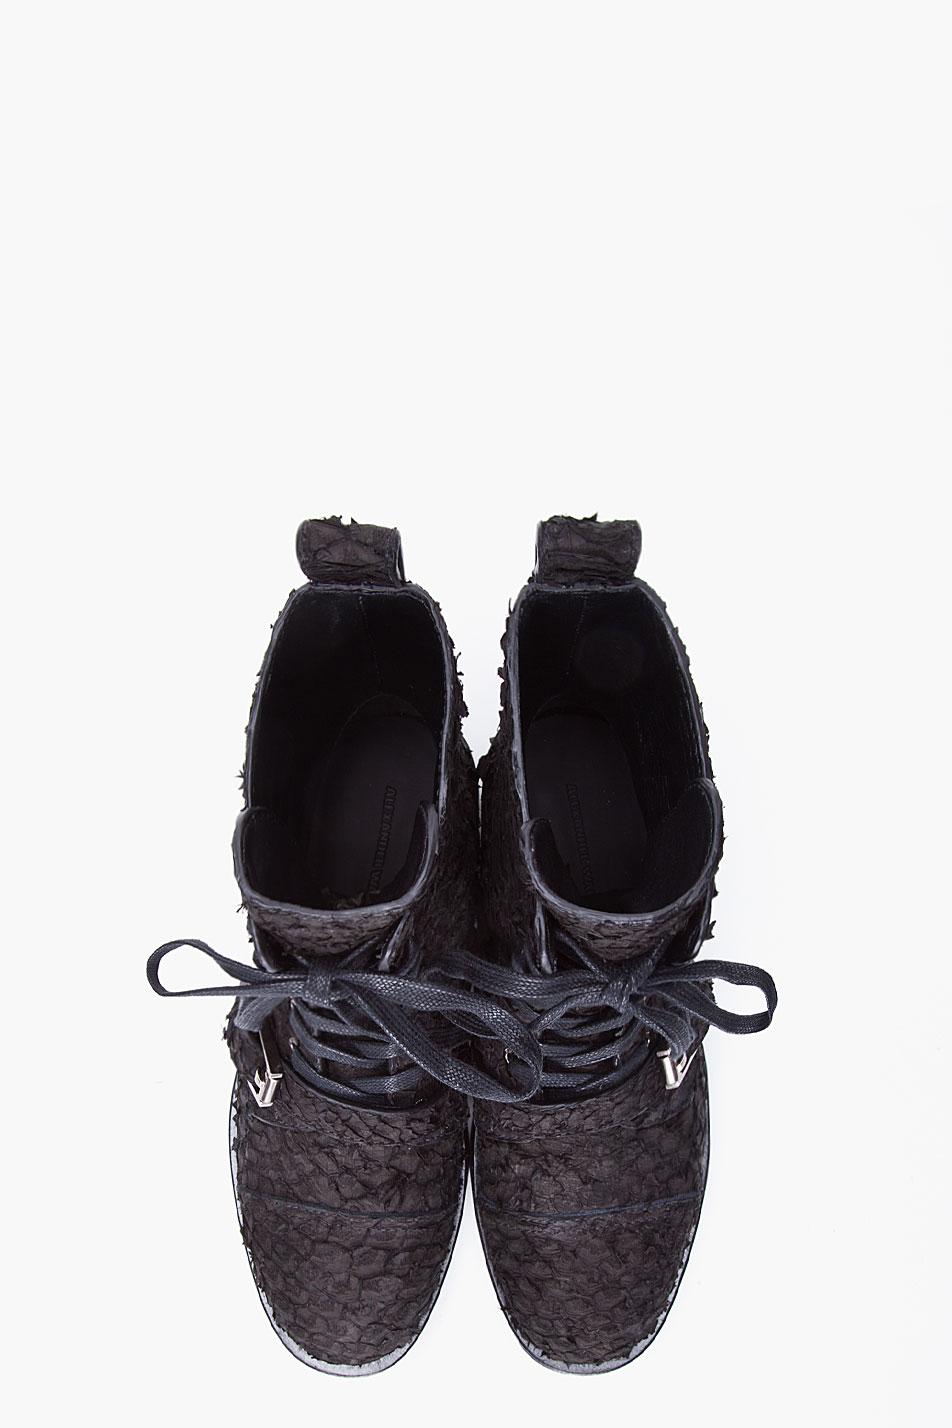 Alexander Wang Black Daria Buckle Combat Boots Lyst